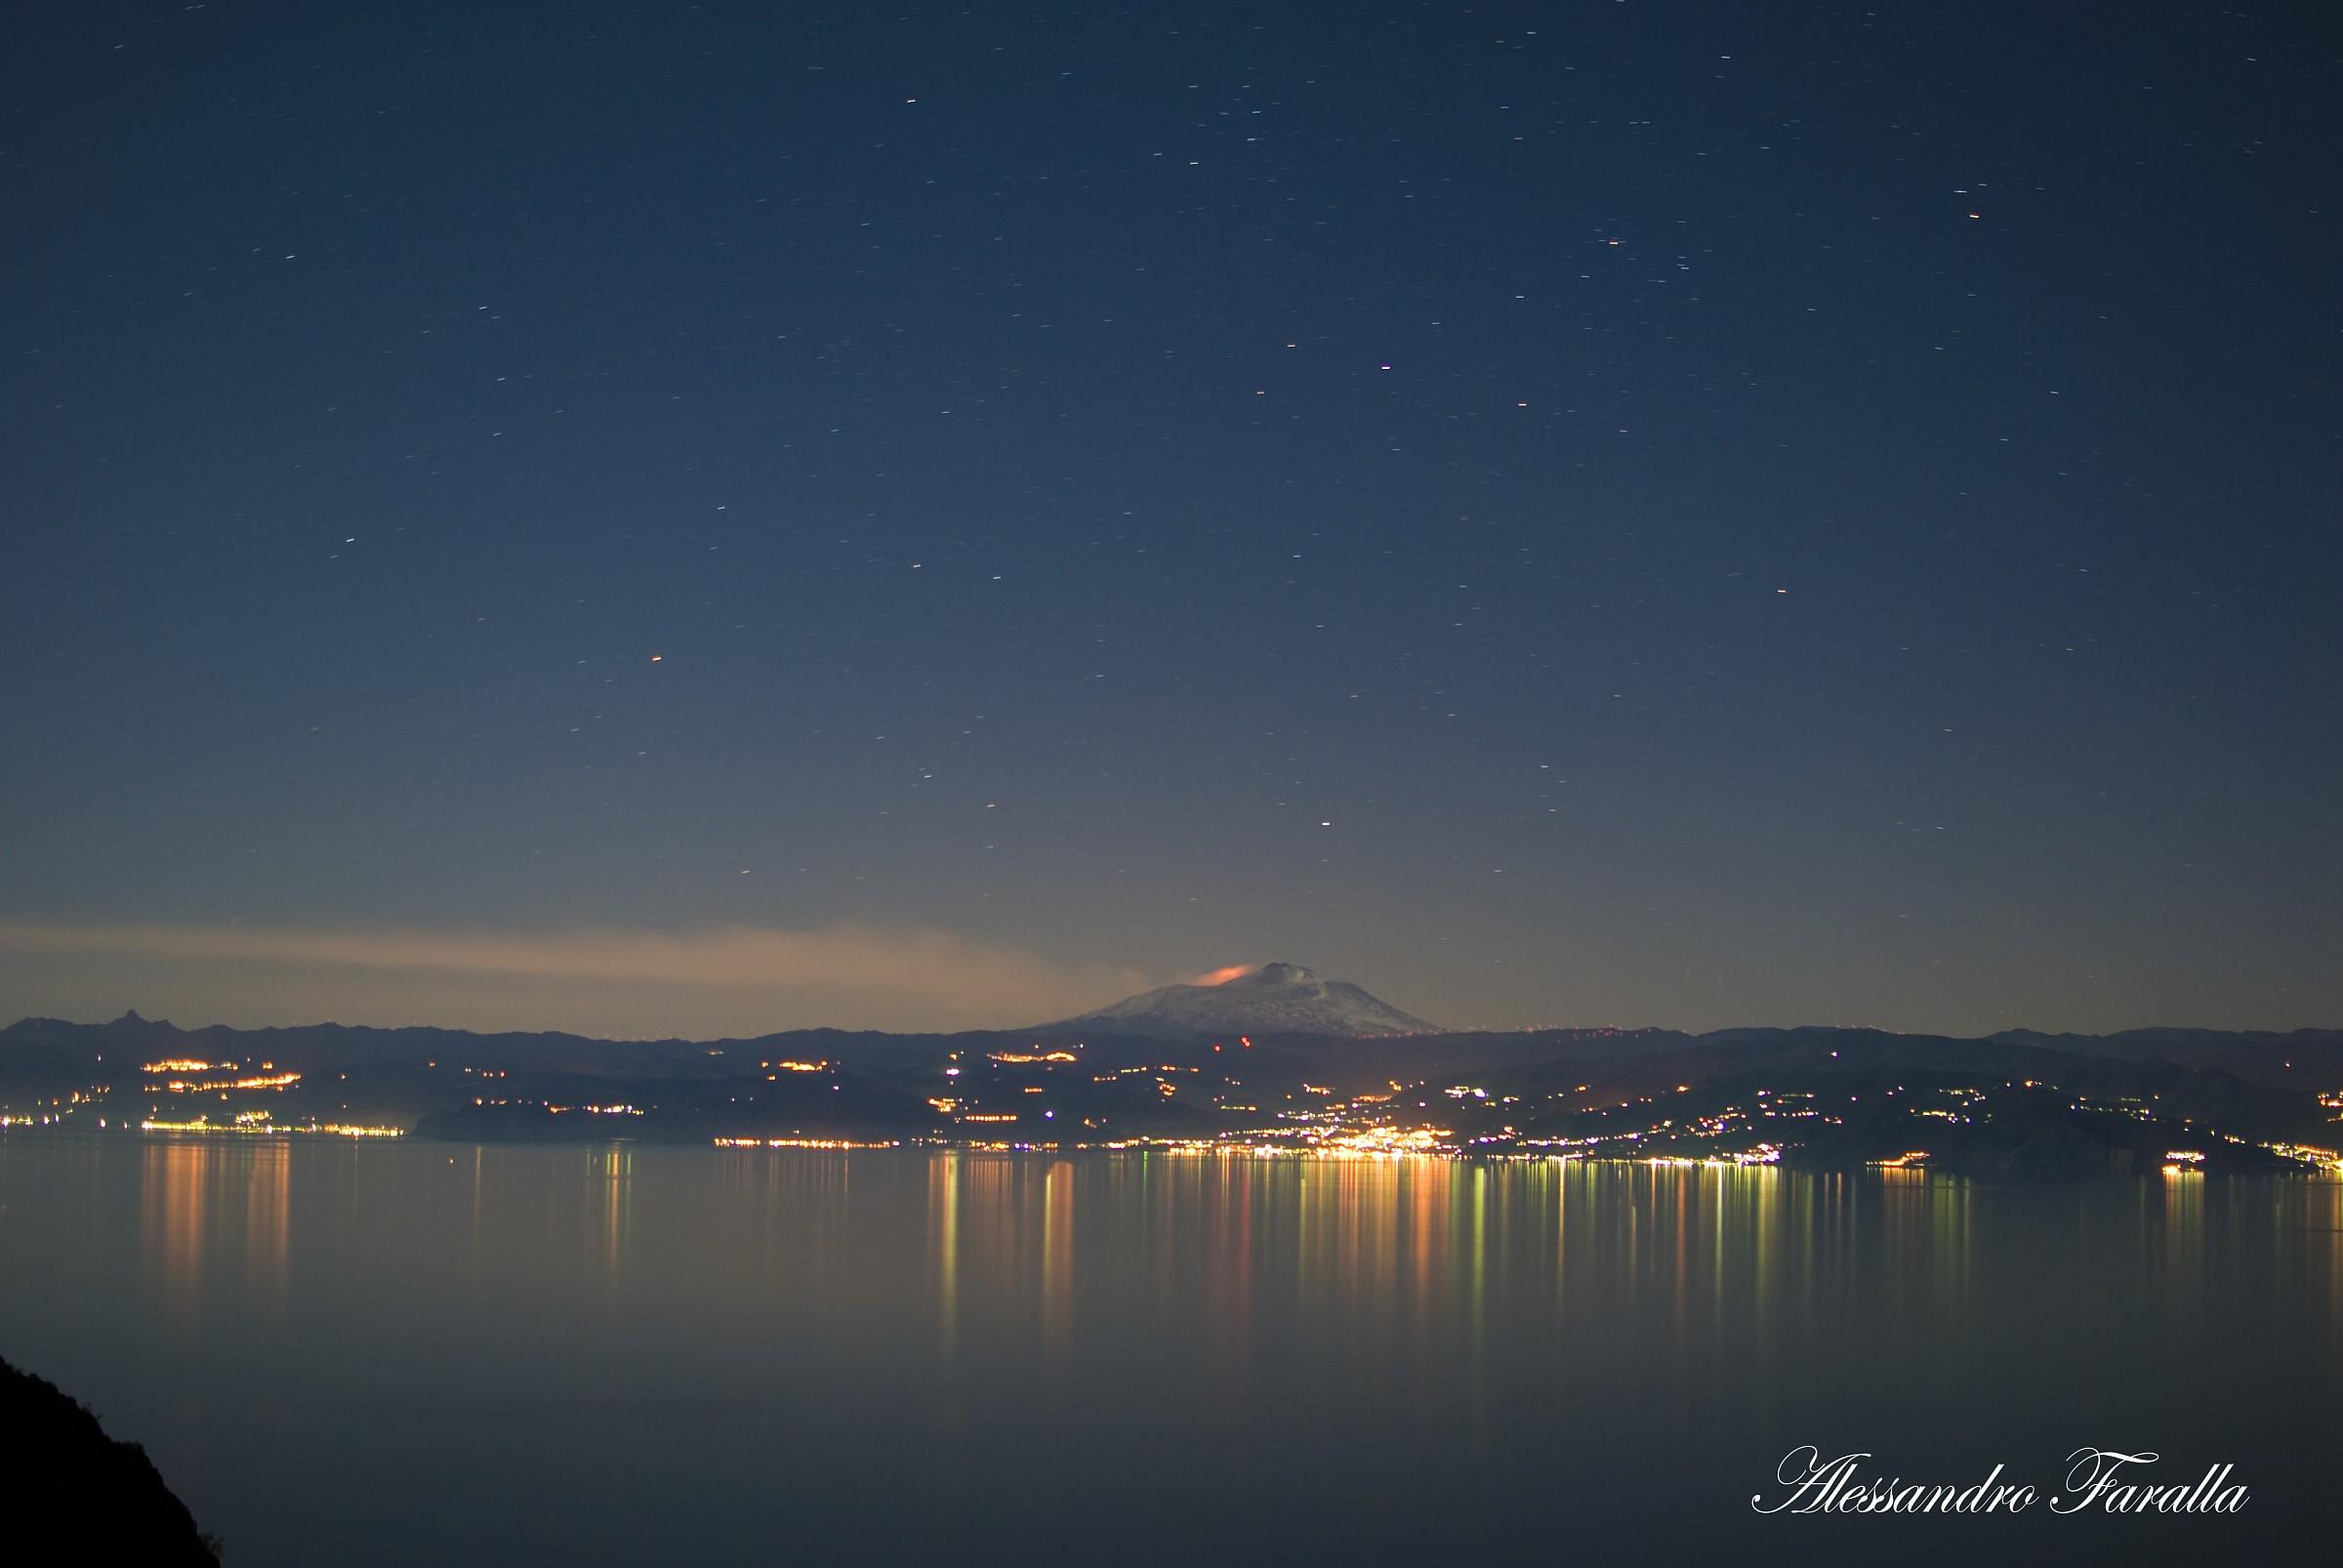 16 02 14 from Etna Volcano...